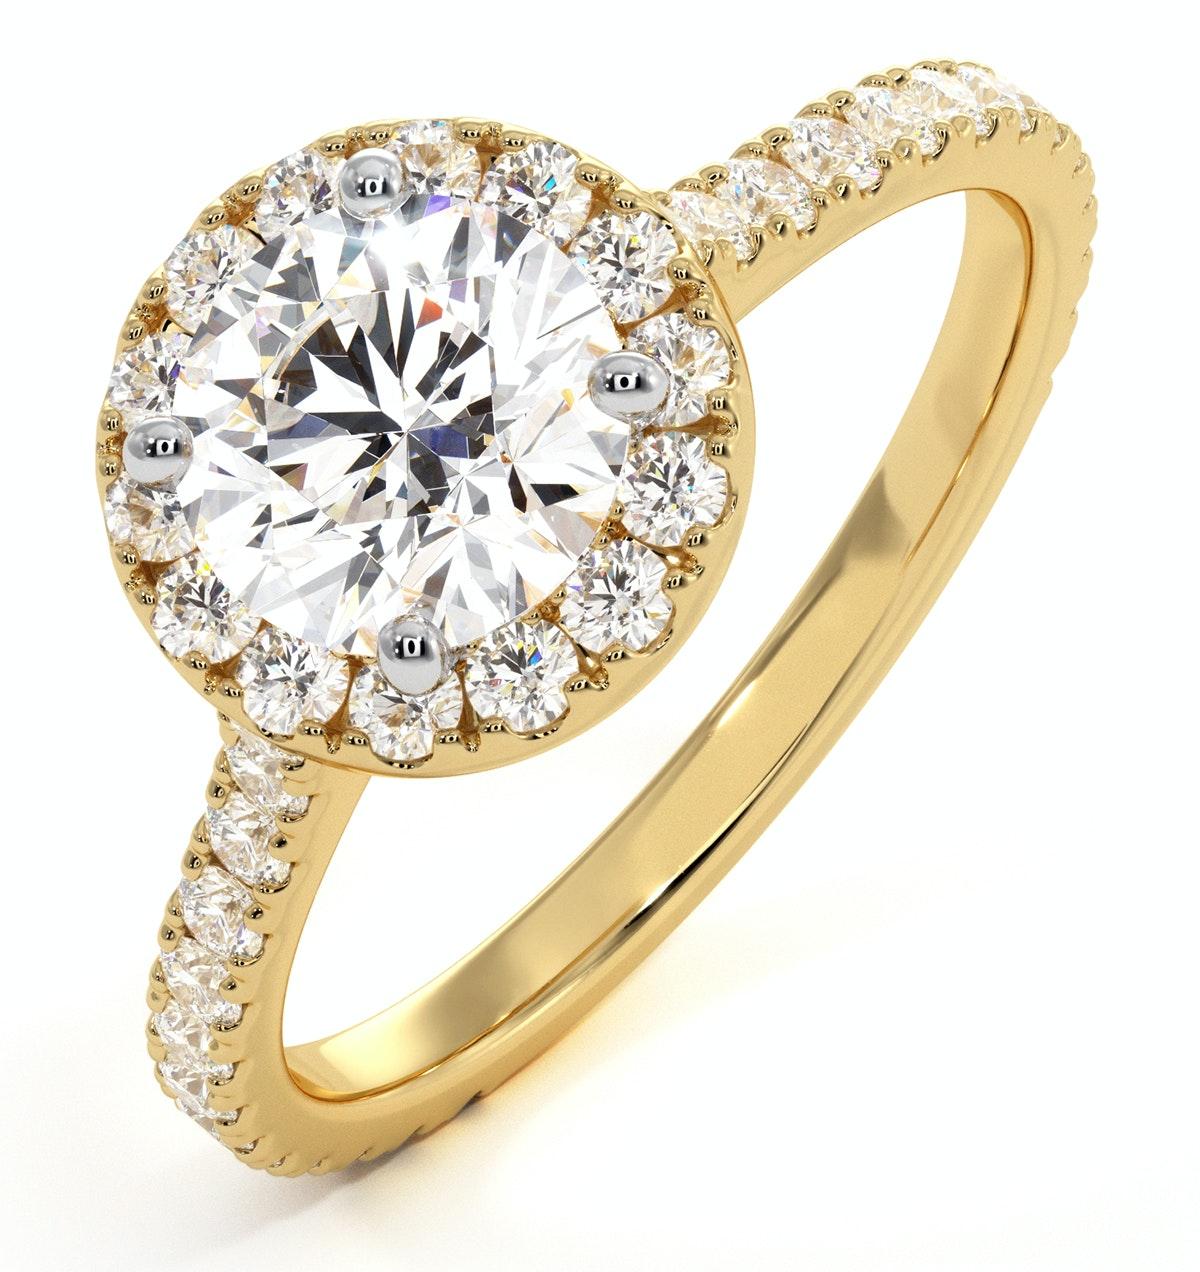 Reina GIA Diamond Halo Engagement Ring in 18K Gold 1.80ct G/SI2